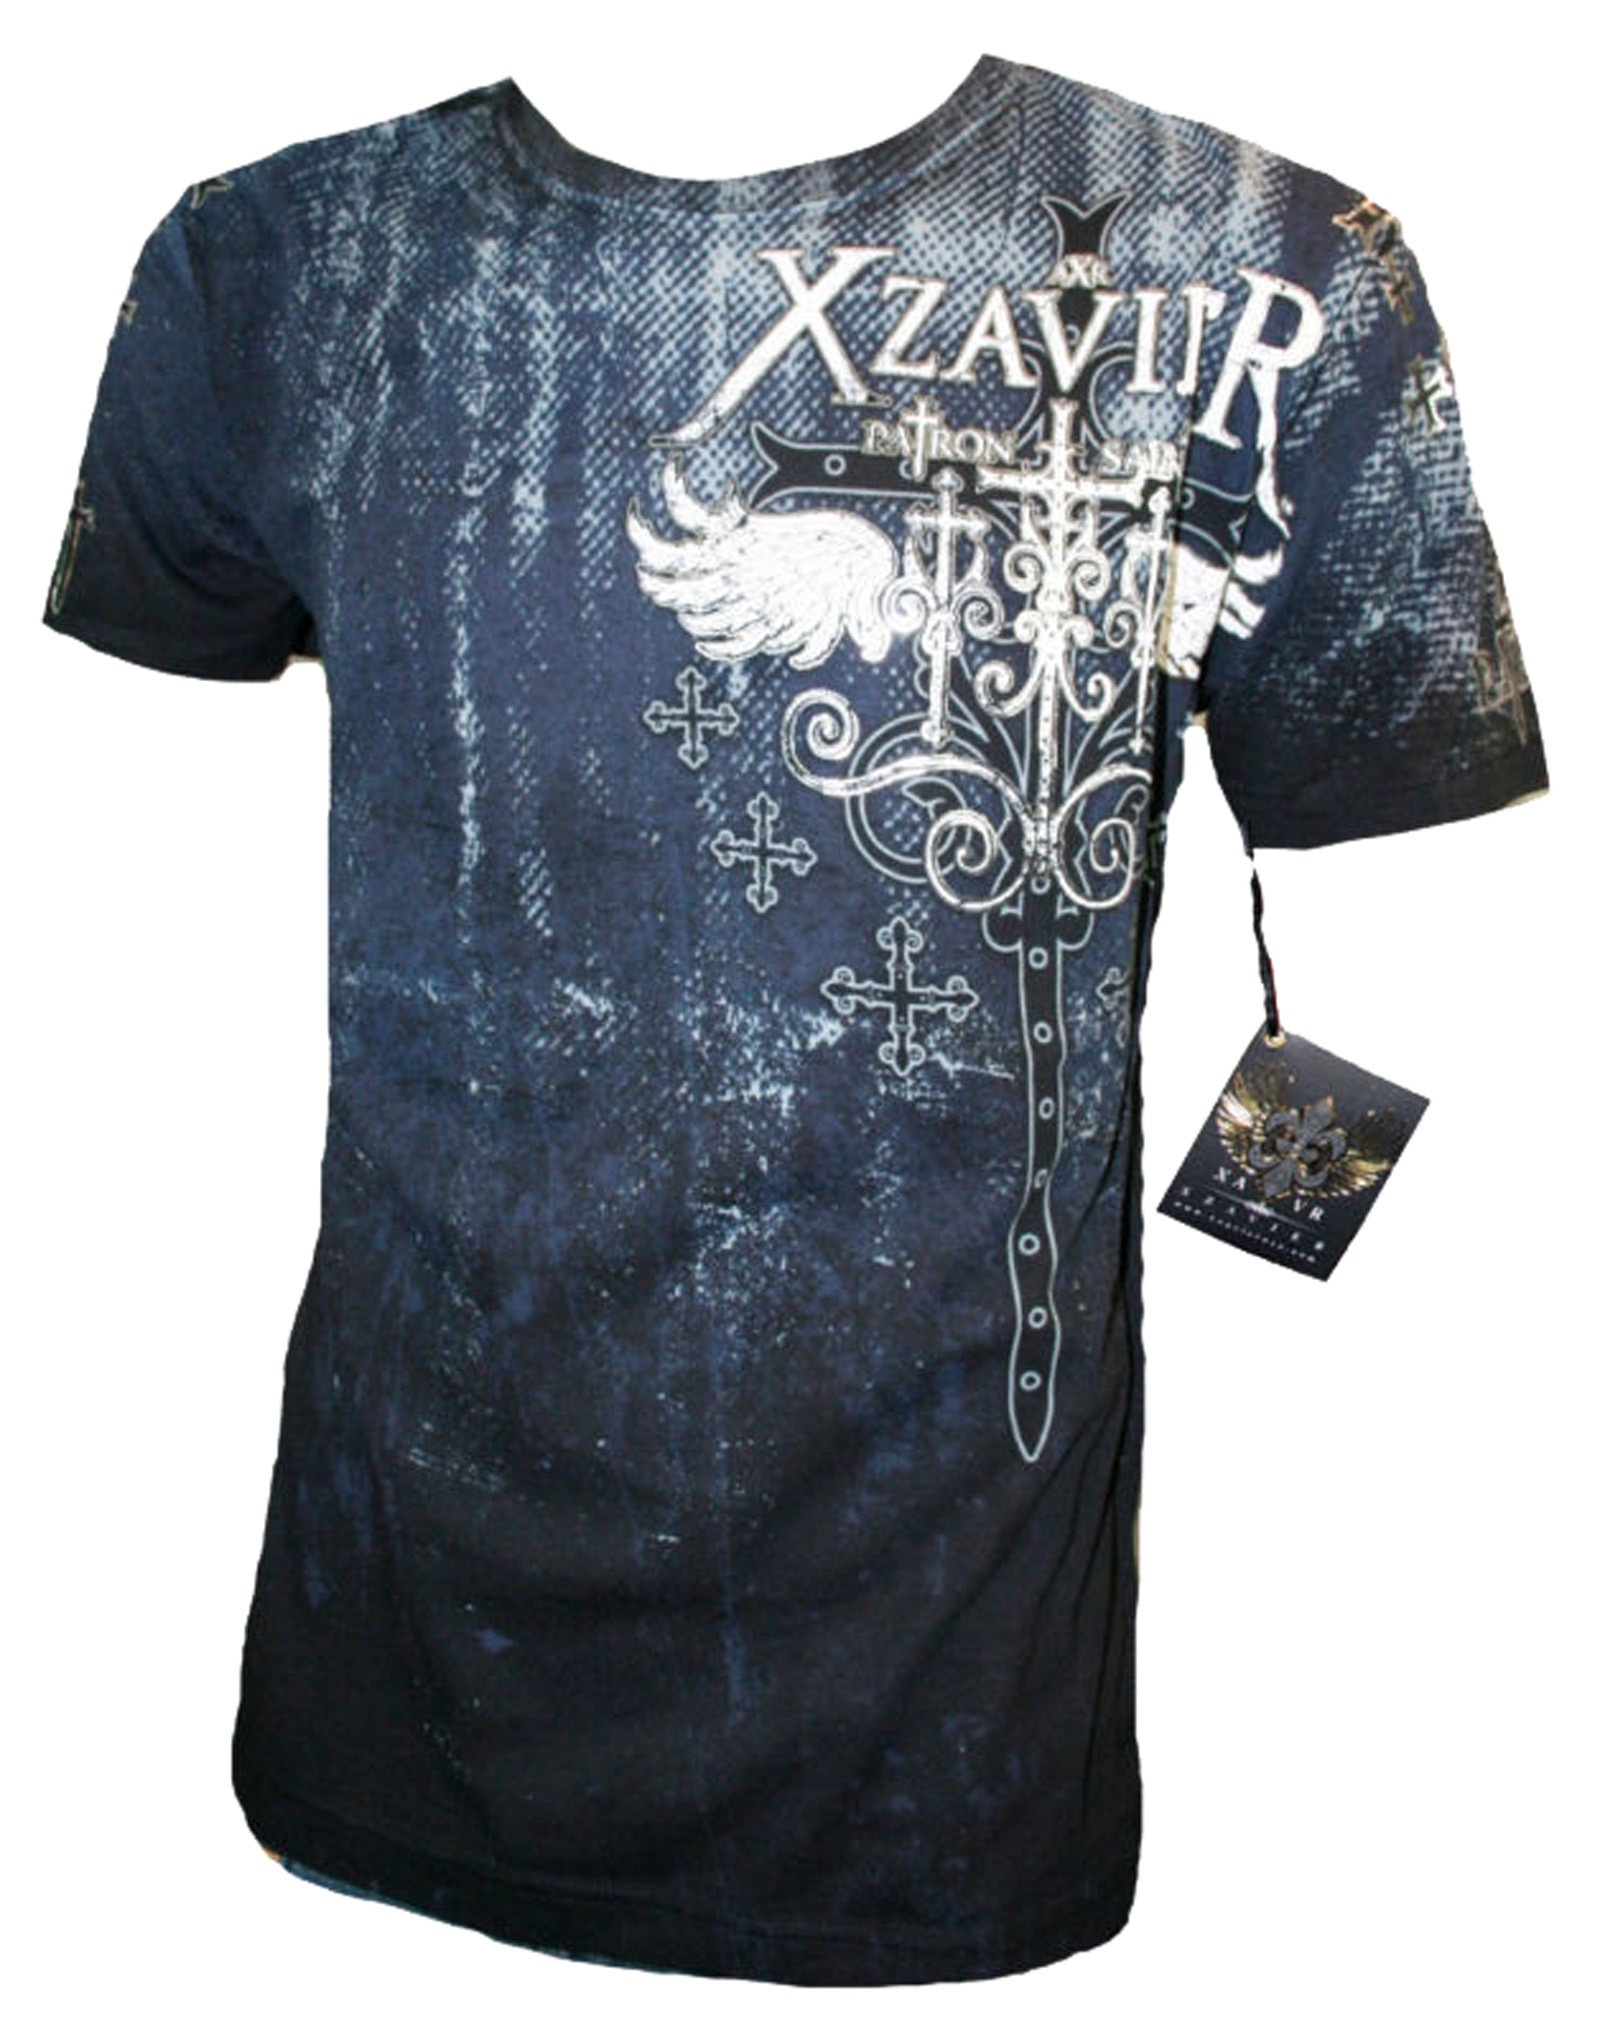 Xzavier - Noble Warrior T-Shirt Front